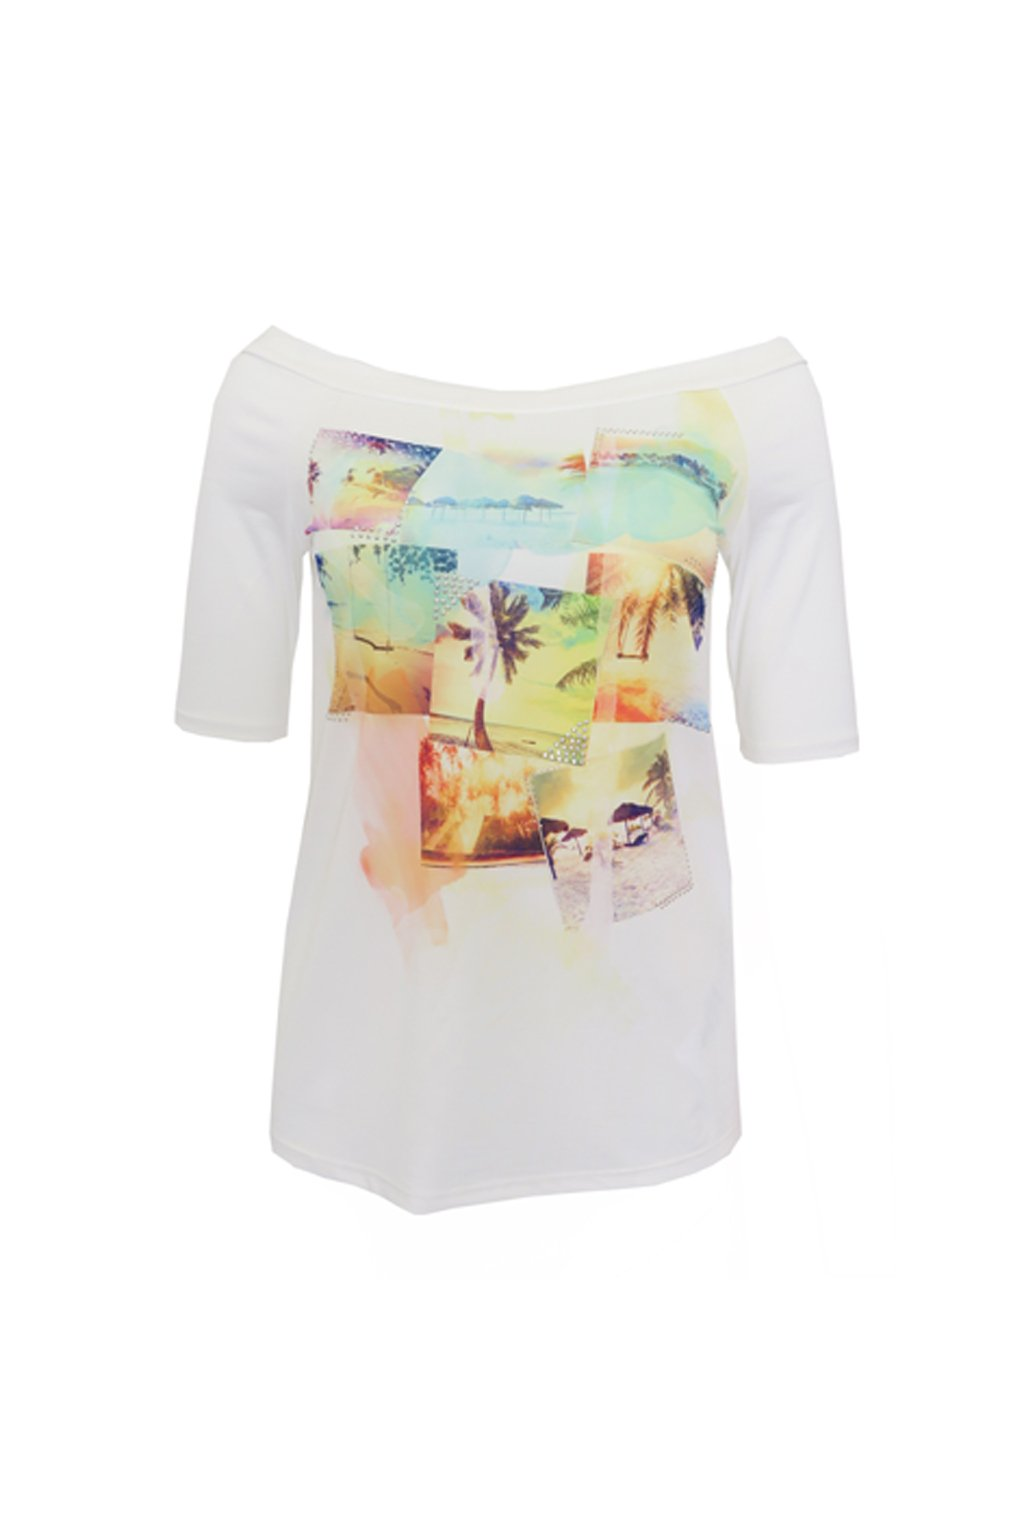 "Bílé tričko ""na pláži"" Bréal"